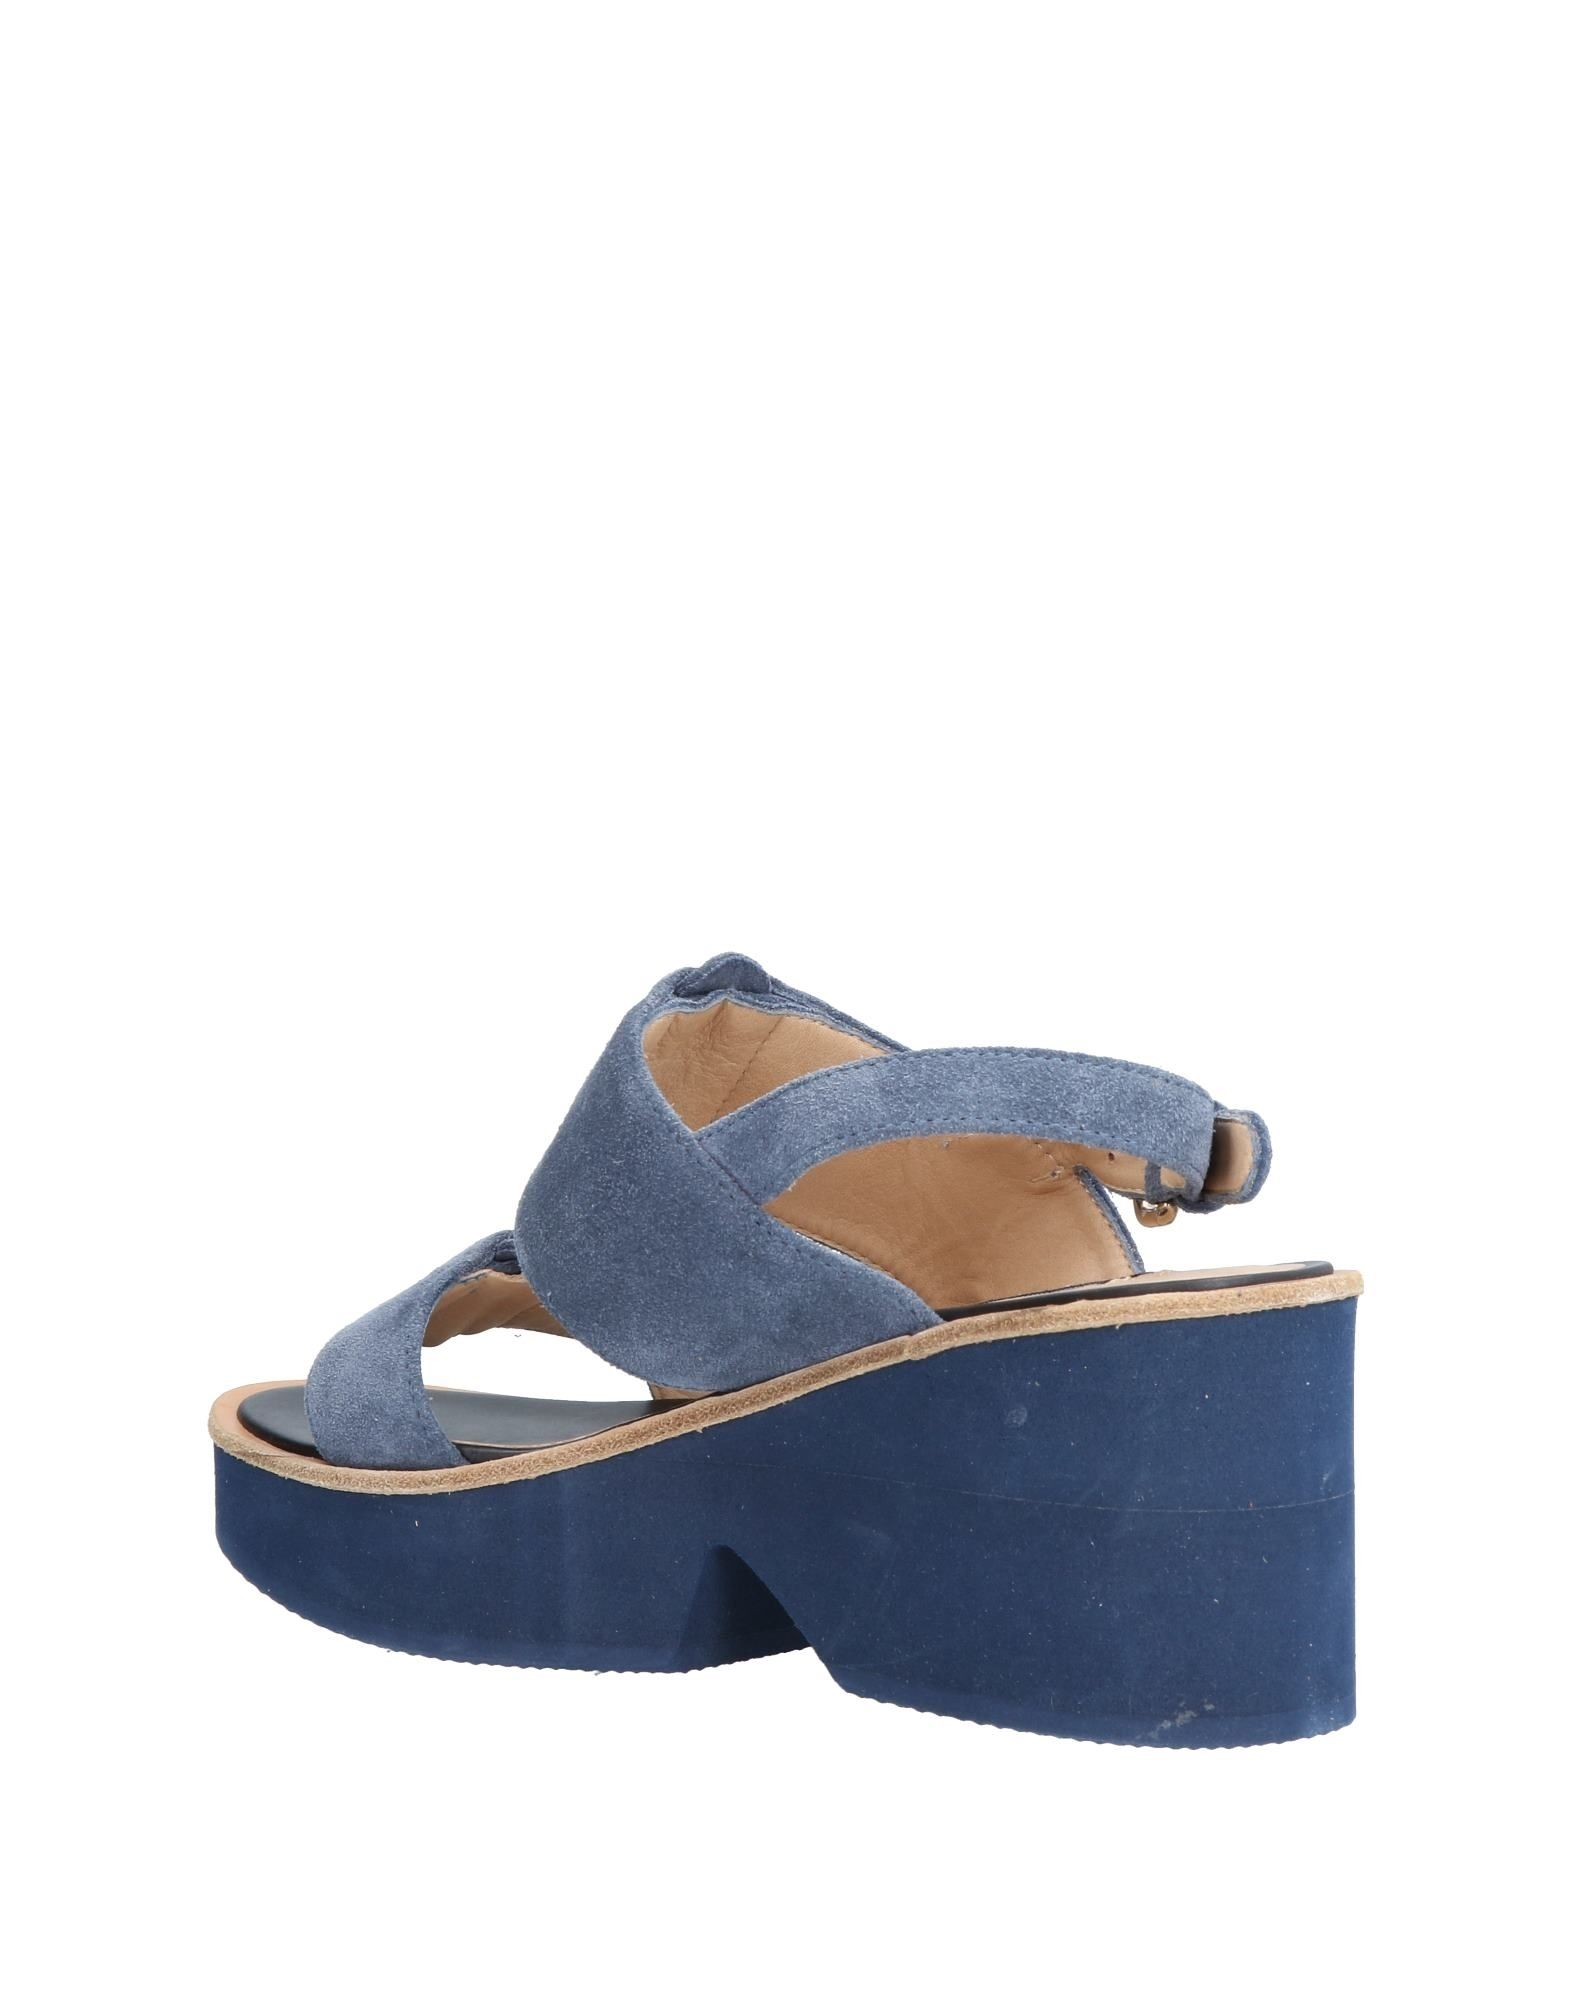 Fratelli Rossetti Sandalen Schuhe Damen  11440686TL Neue Schuhe Sandalen f4f54f